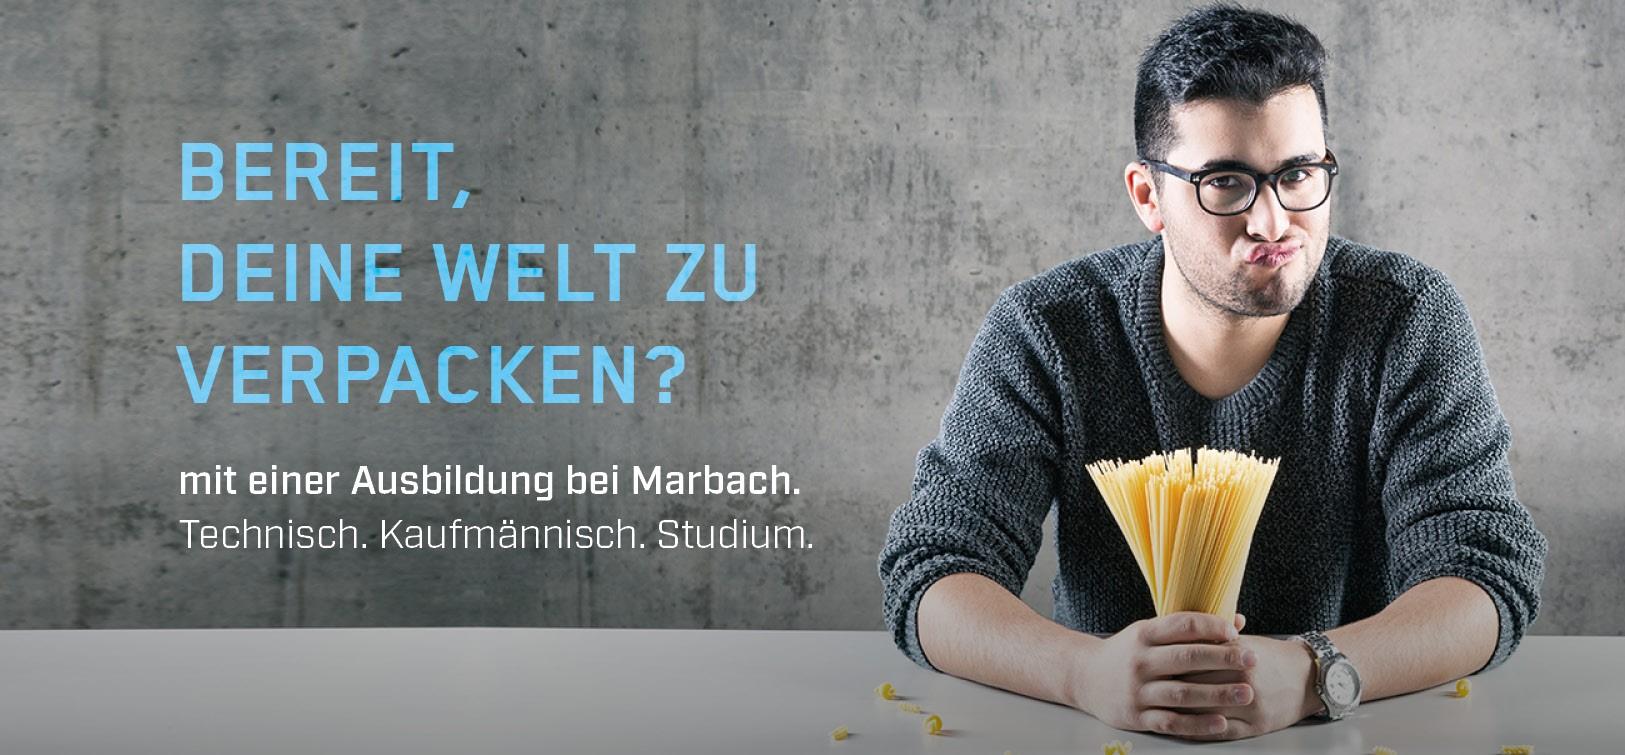 Marbach-Werbung.jpg